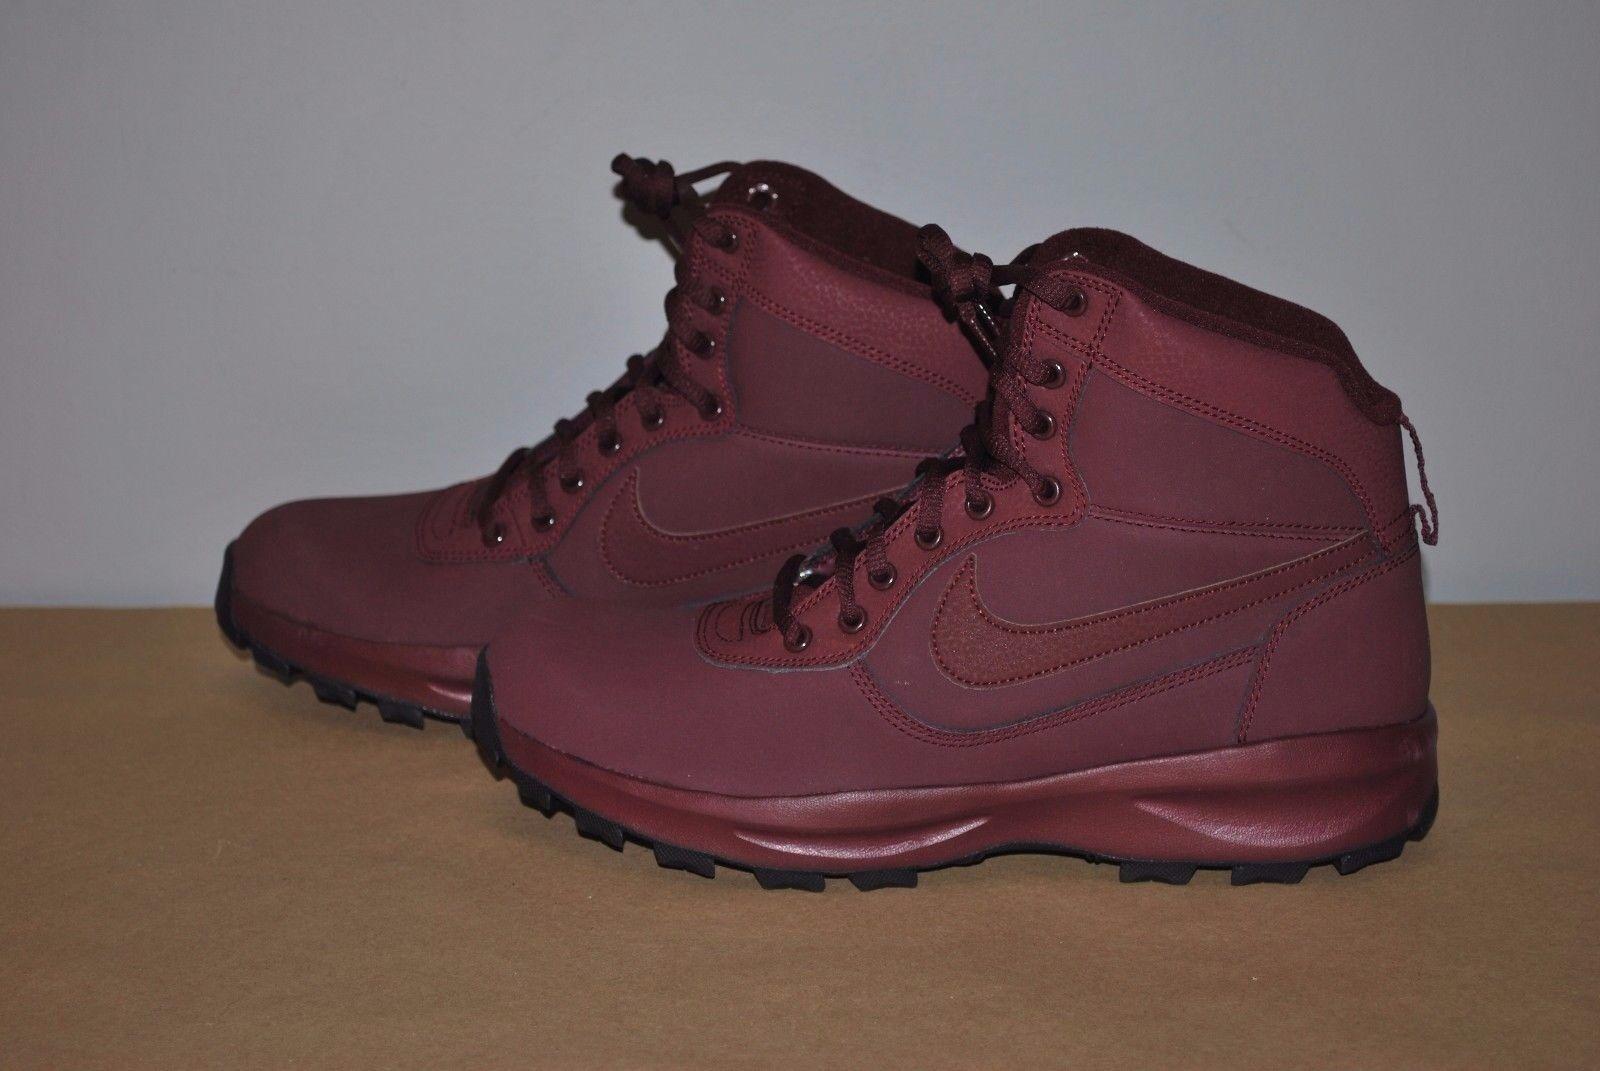 Nike MANOADOME Hiking Boots Sneakerboot Night Maroon 844358-600 Mens Size - 10.5